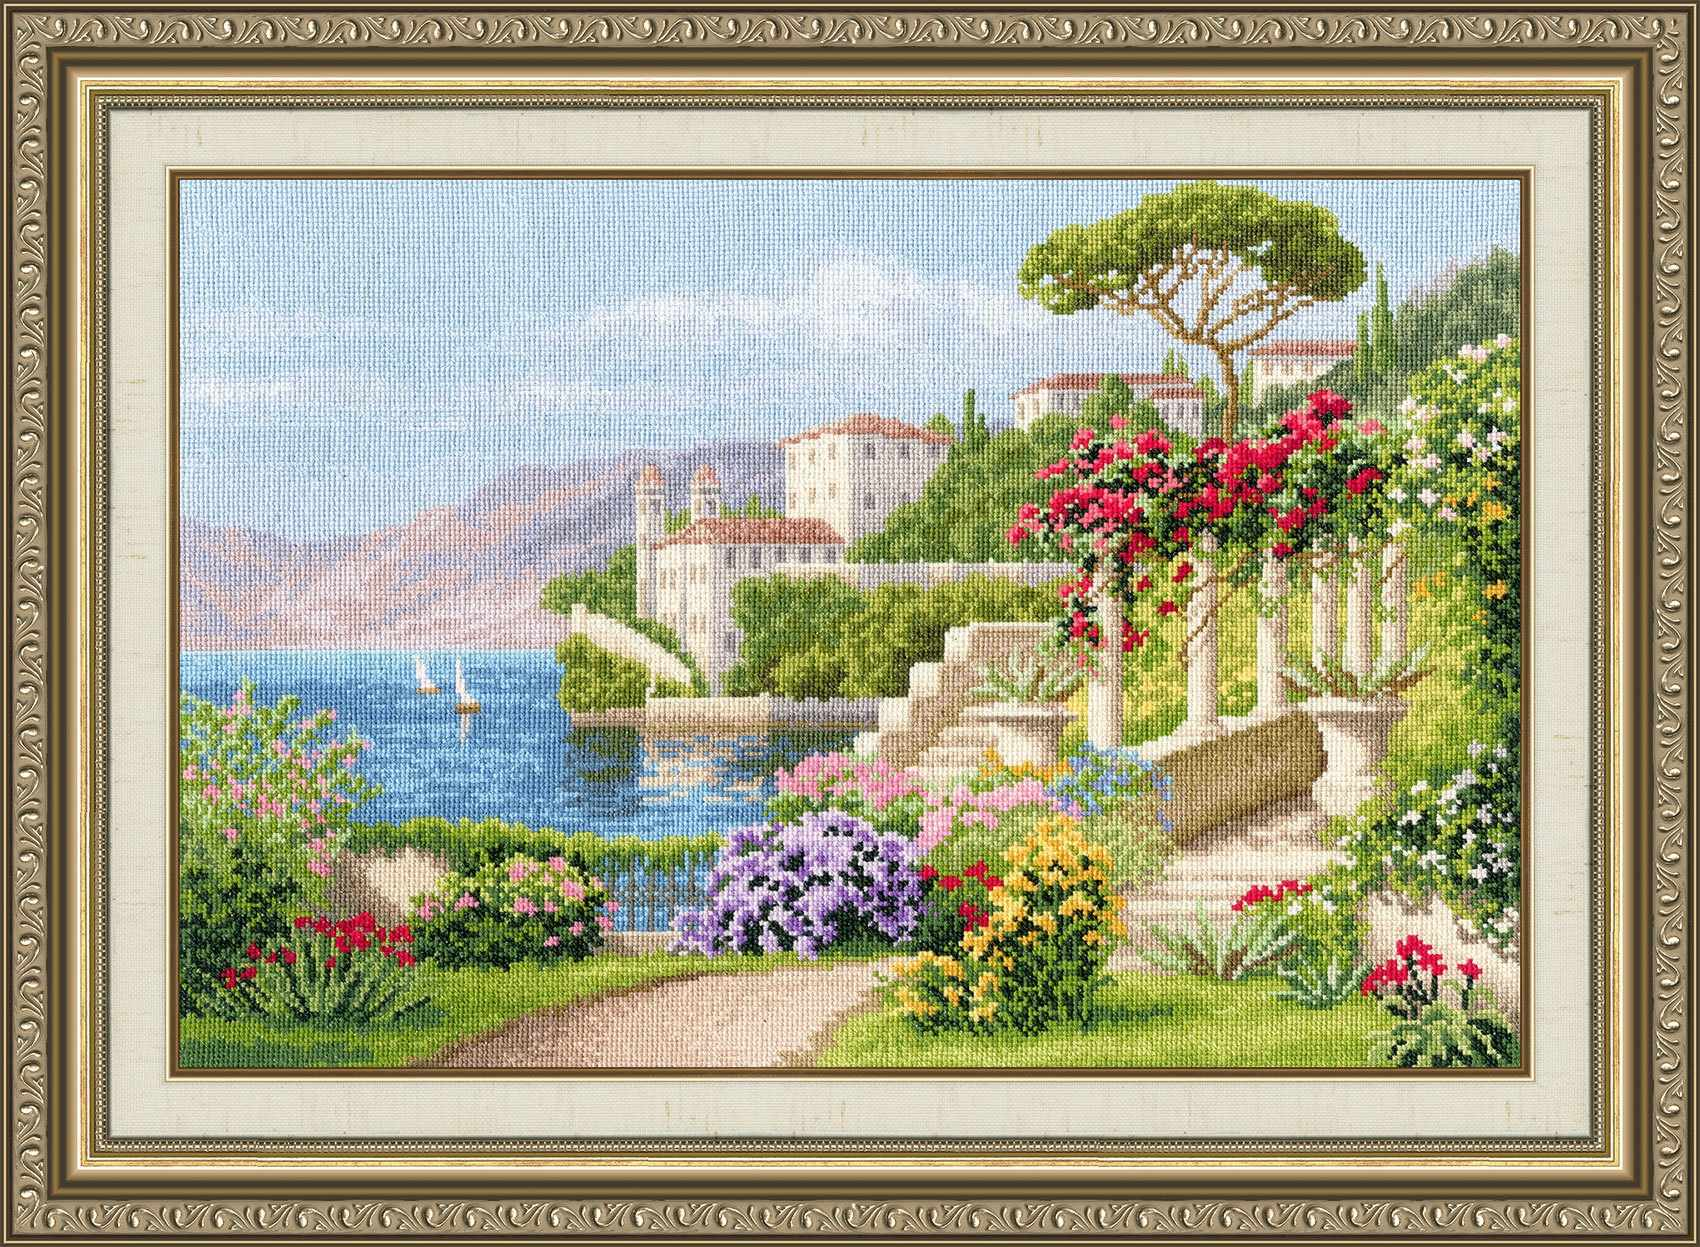 ДЛ-034 Цветущая Италия